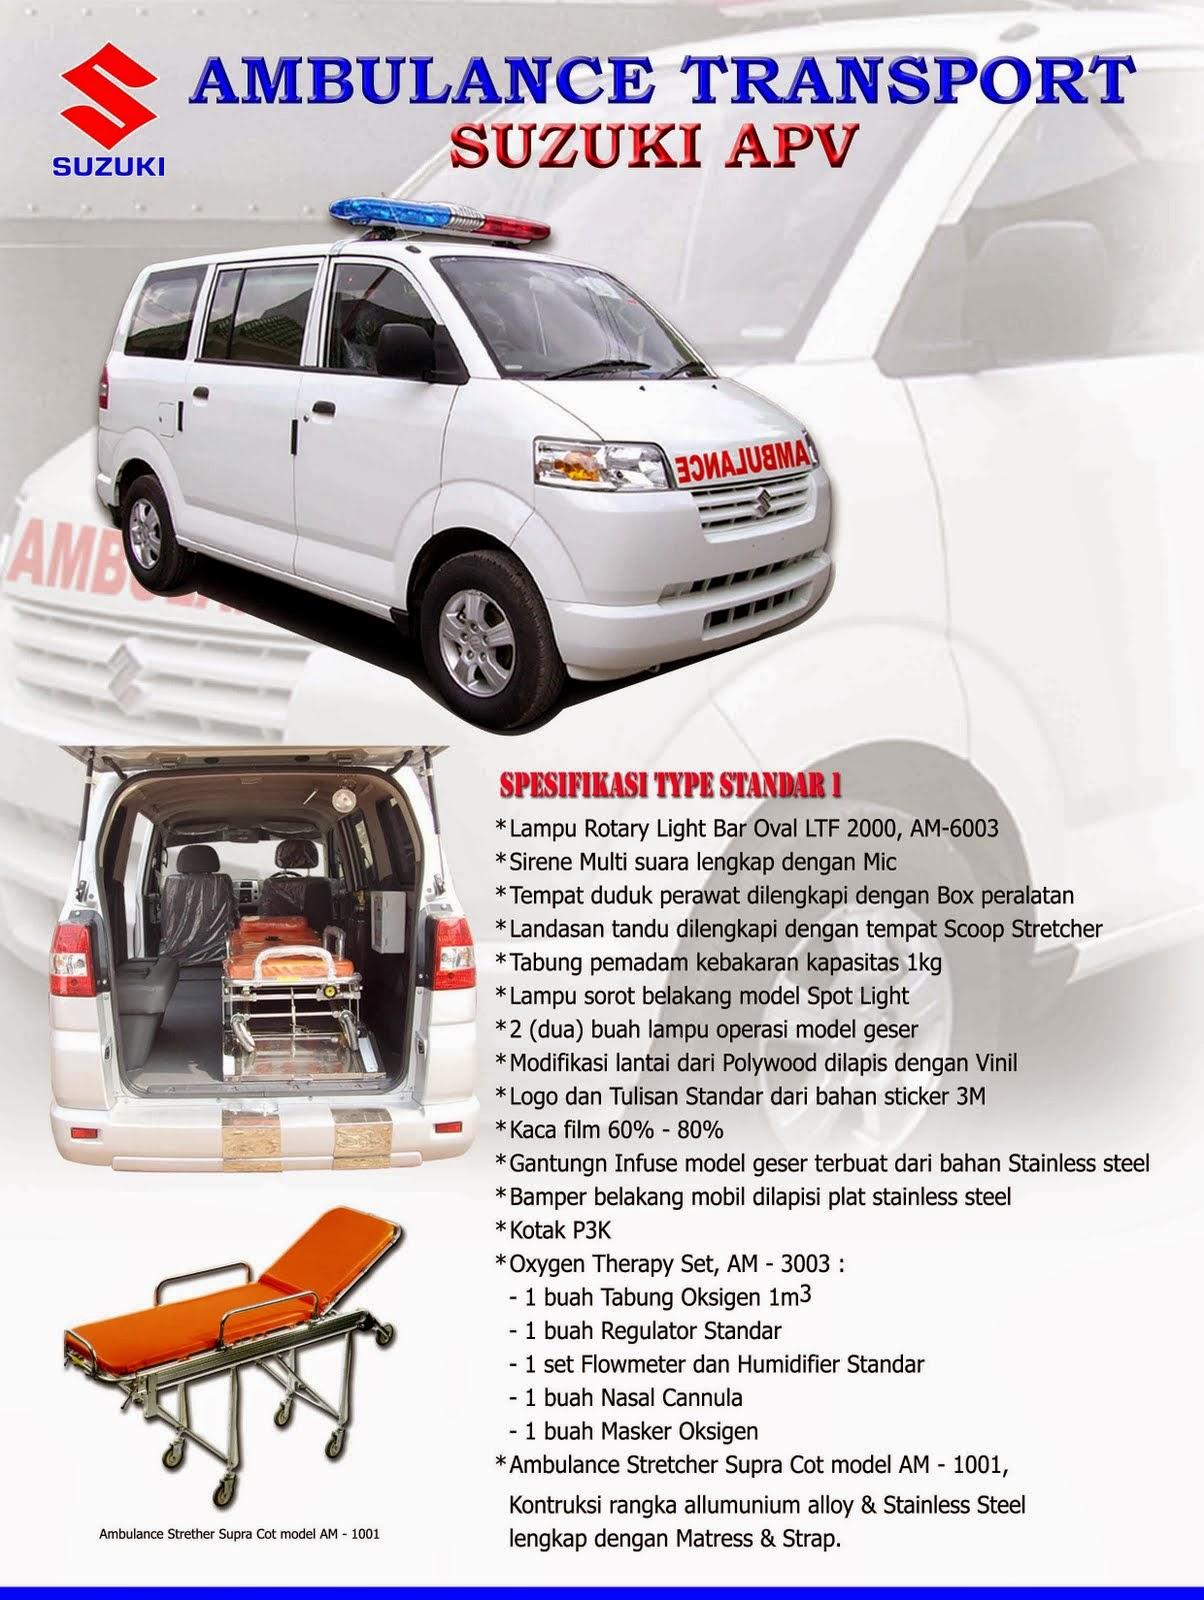 APV Ambulance Spesifikasi Standar-1 2014